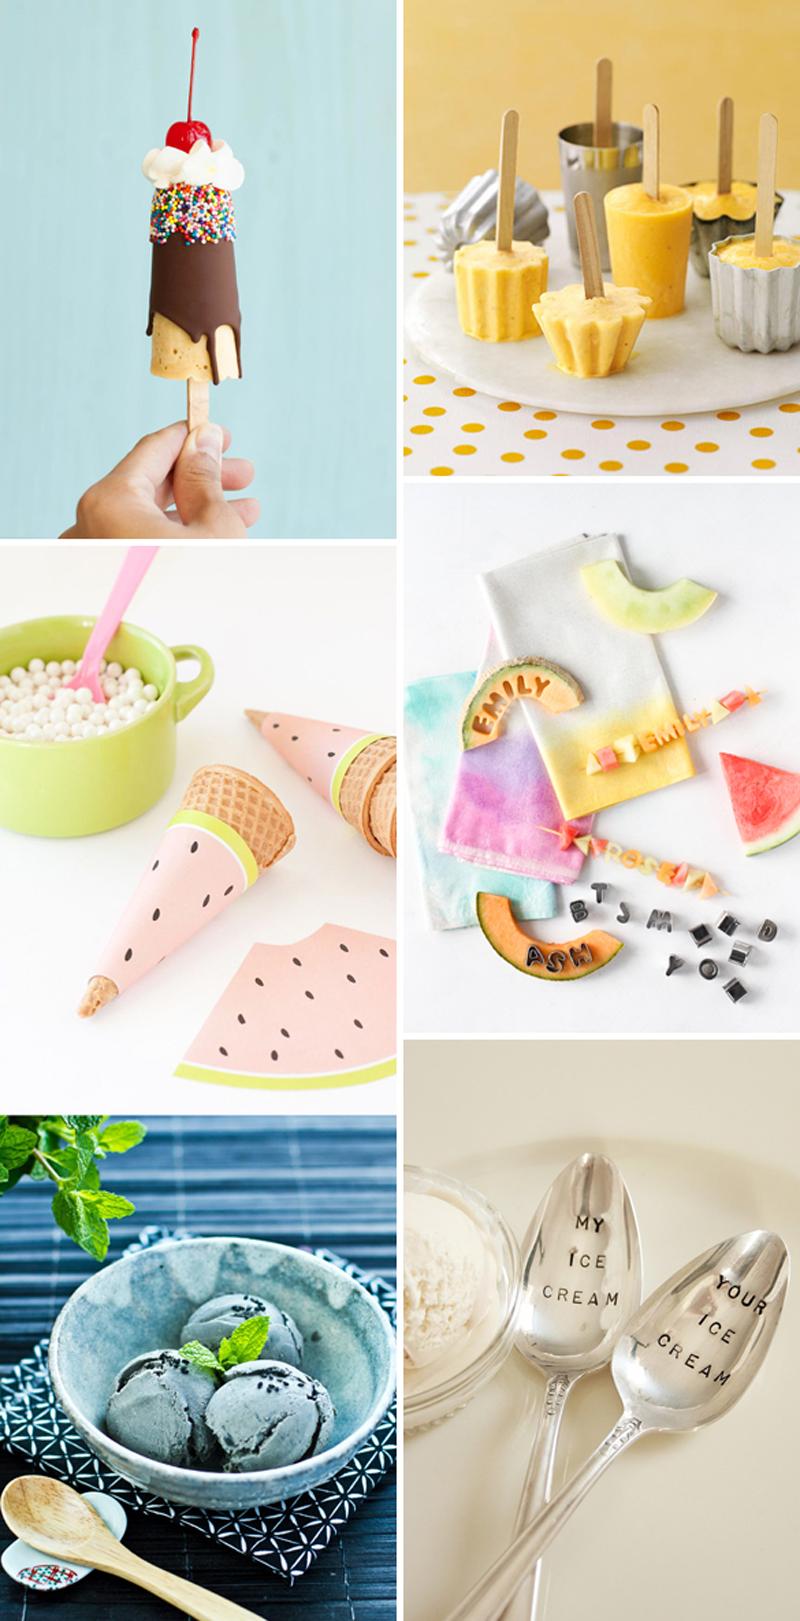 we love Inspiratioin: Ice cream | we love handmade